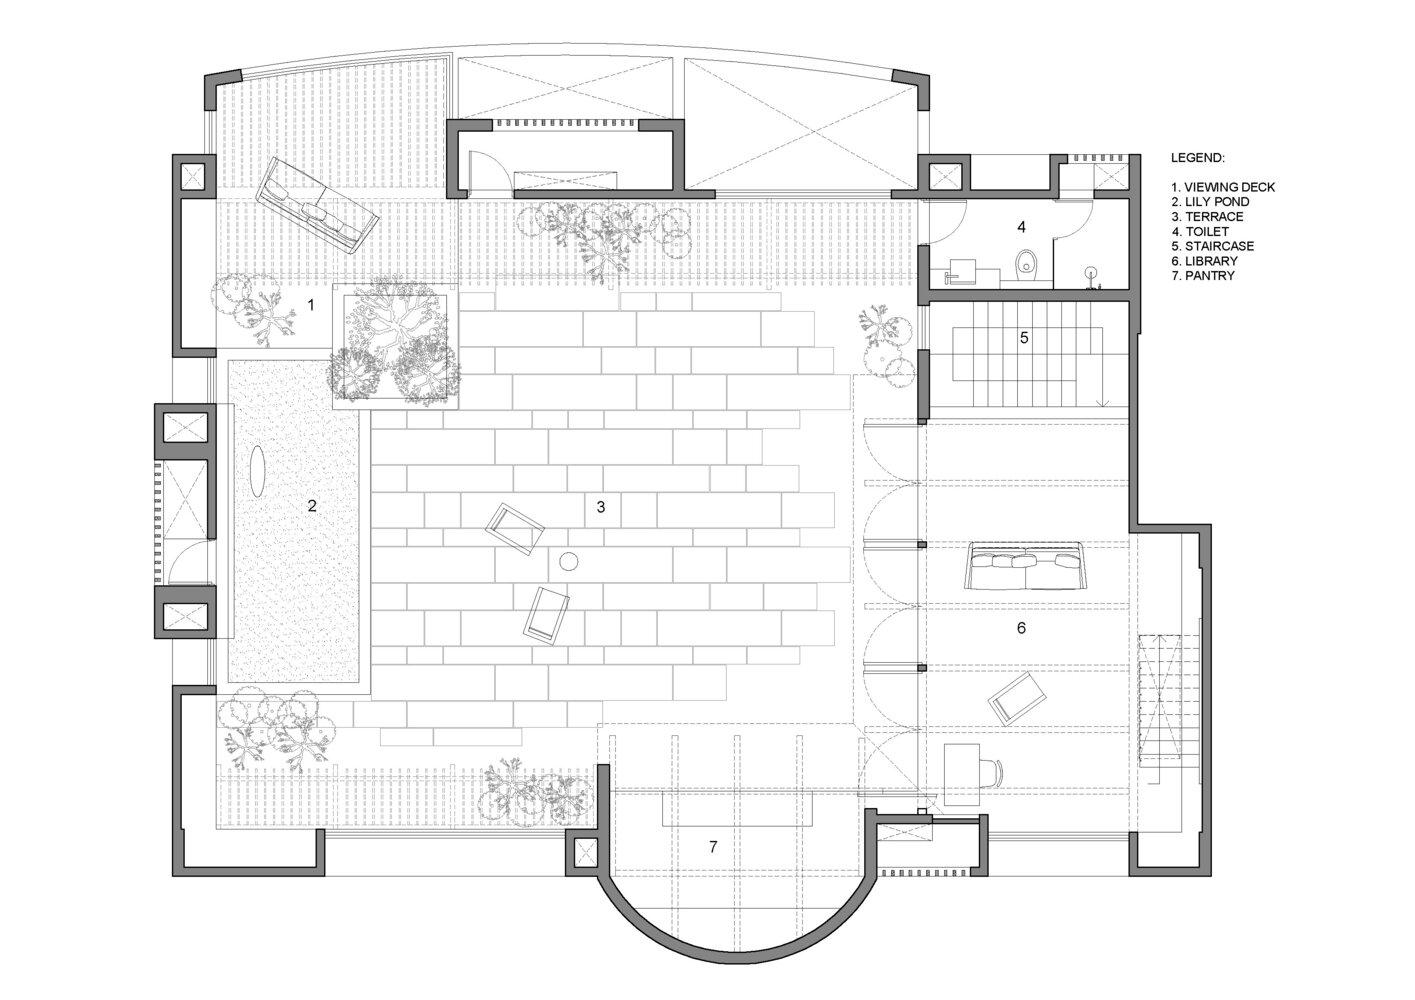 Veranda-on-a-Roof-Studio-Course-India-Floor-Plan-Humble-Homes